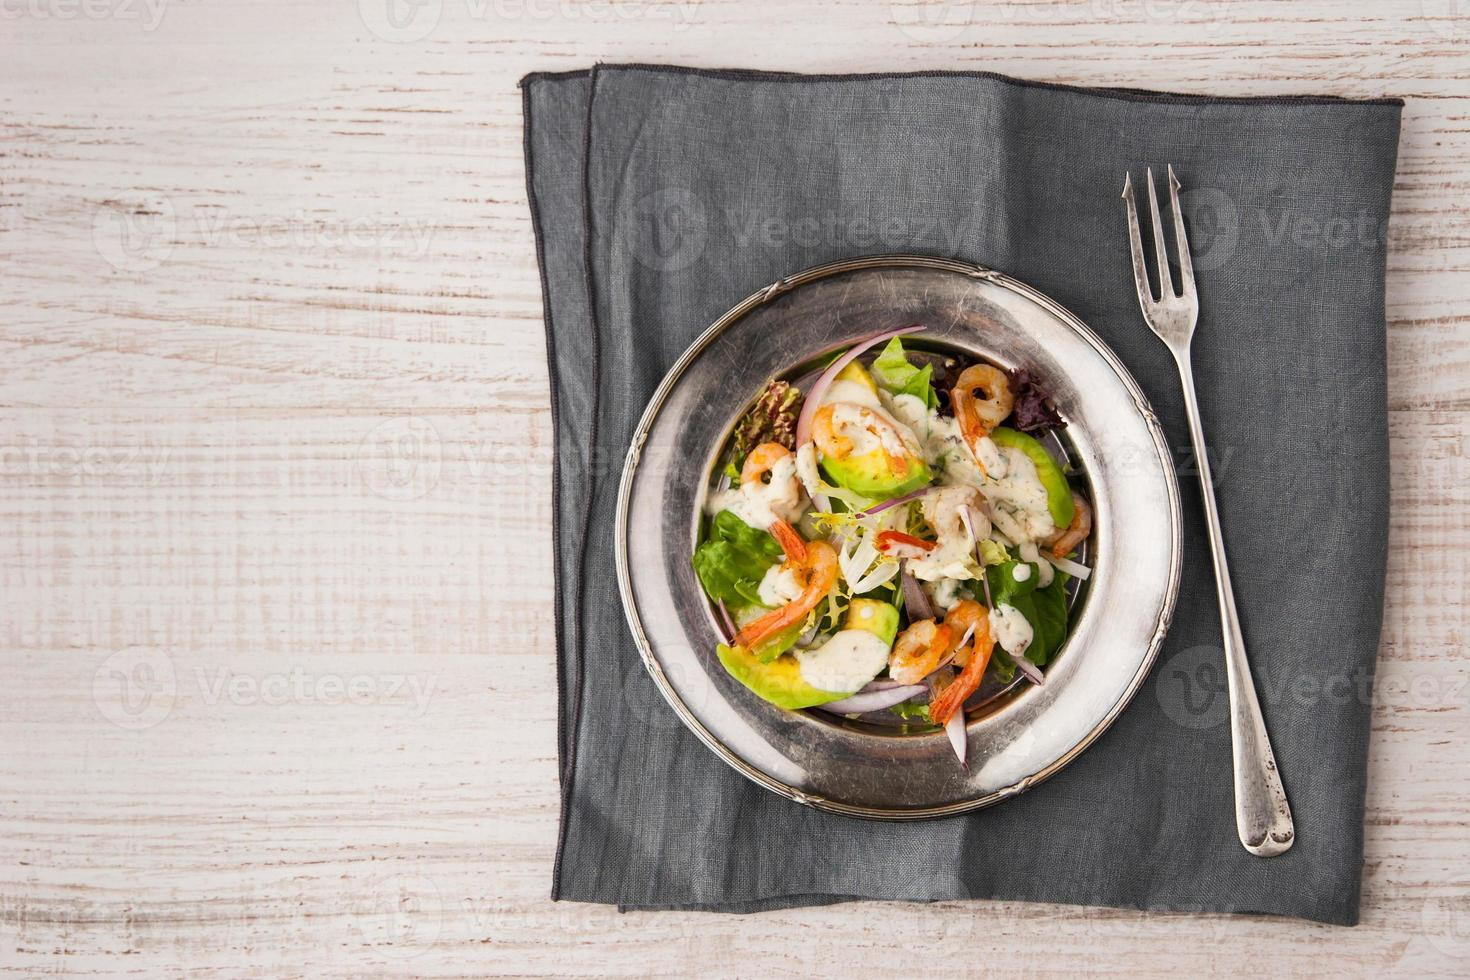 fvocado en garnalen salade op oude plaat met vintage vork foto